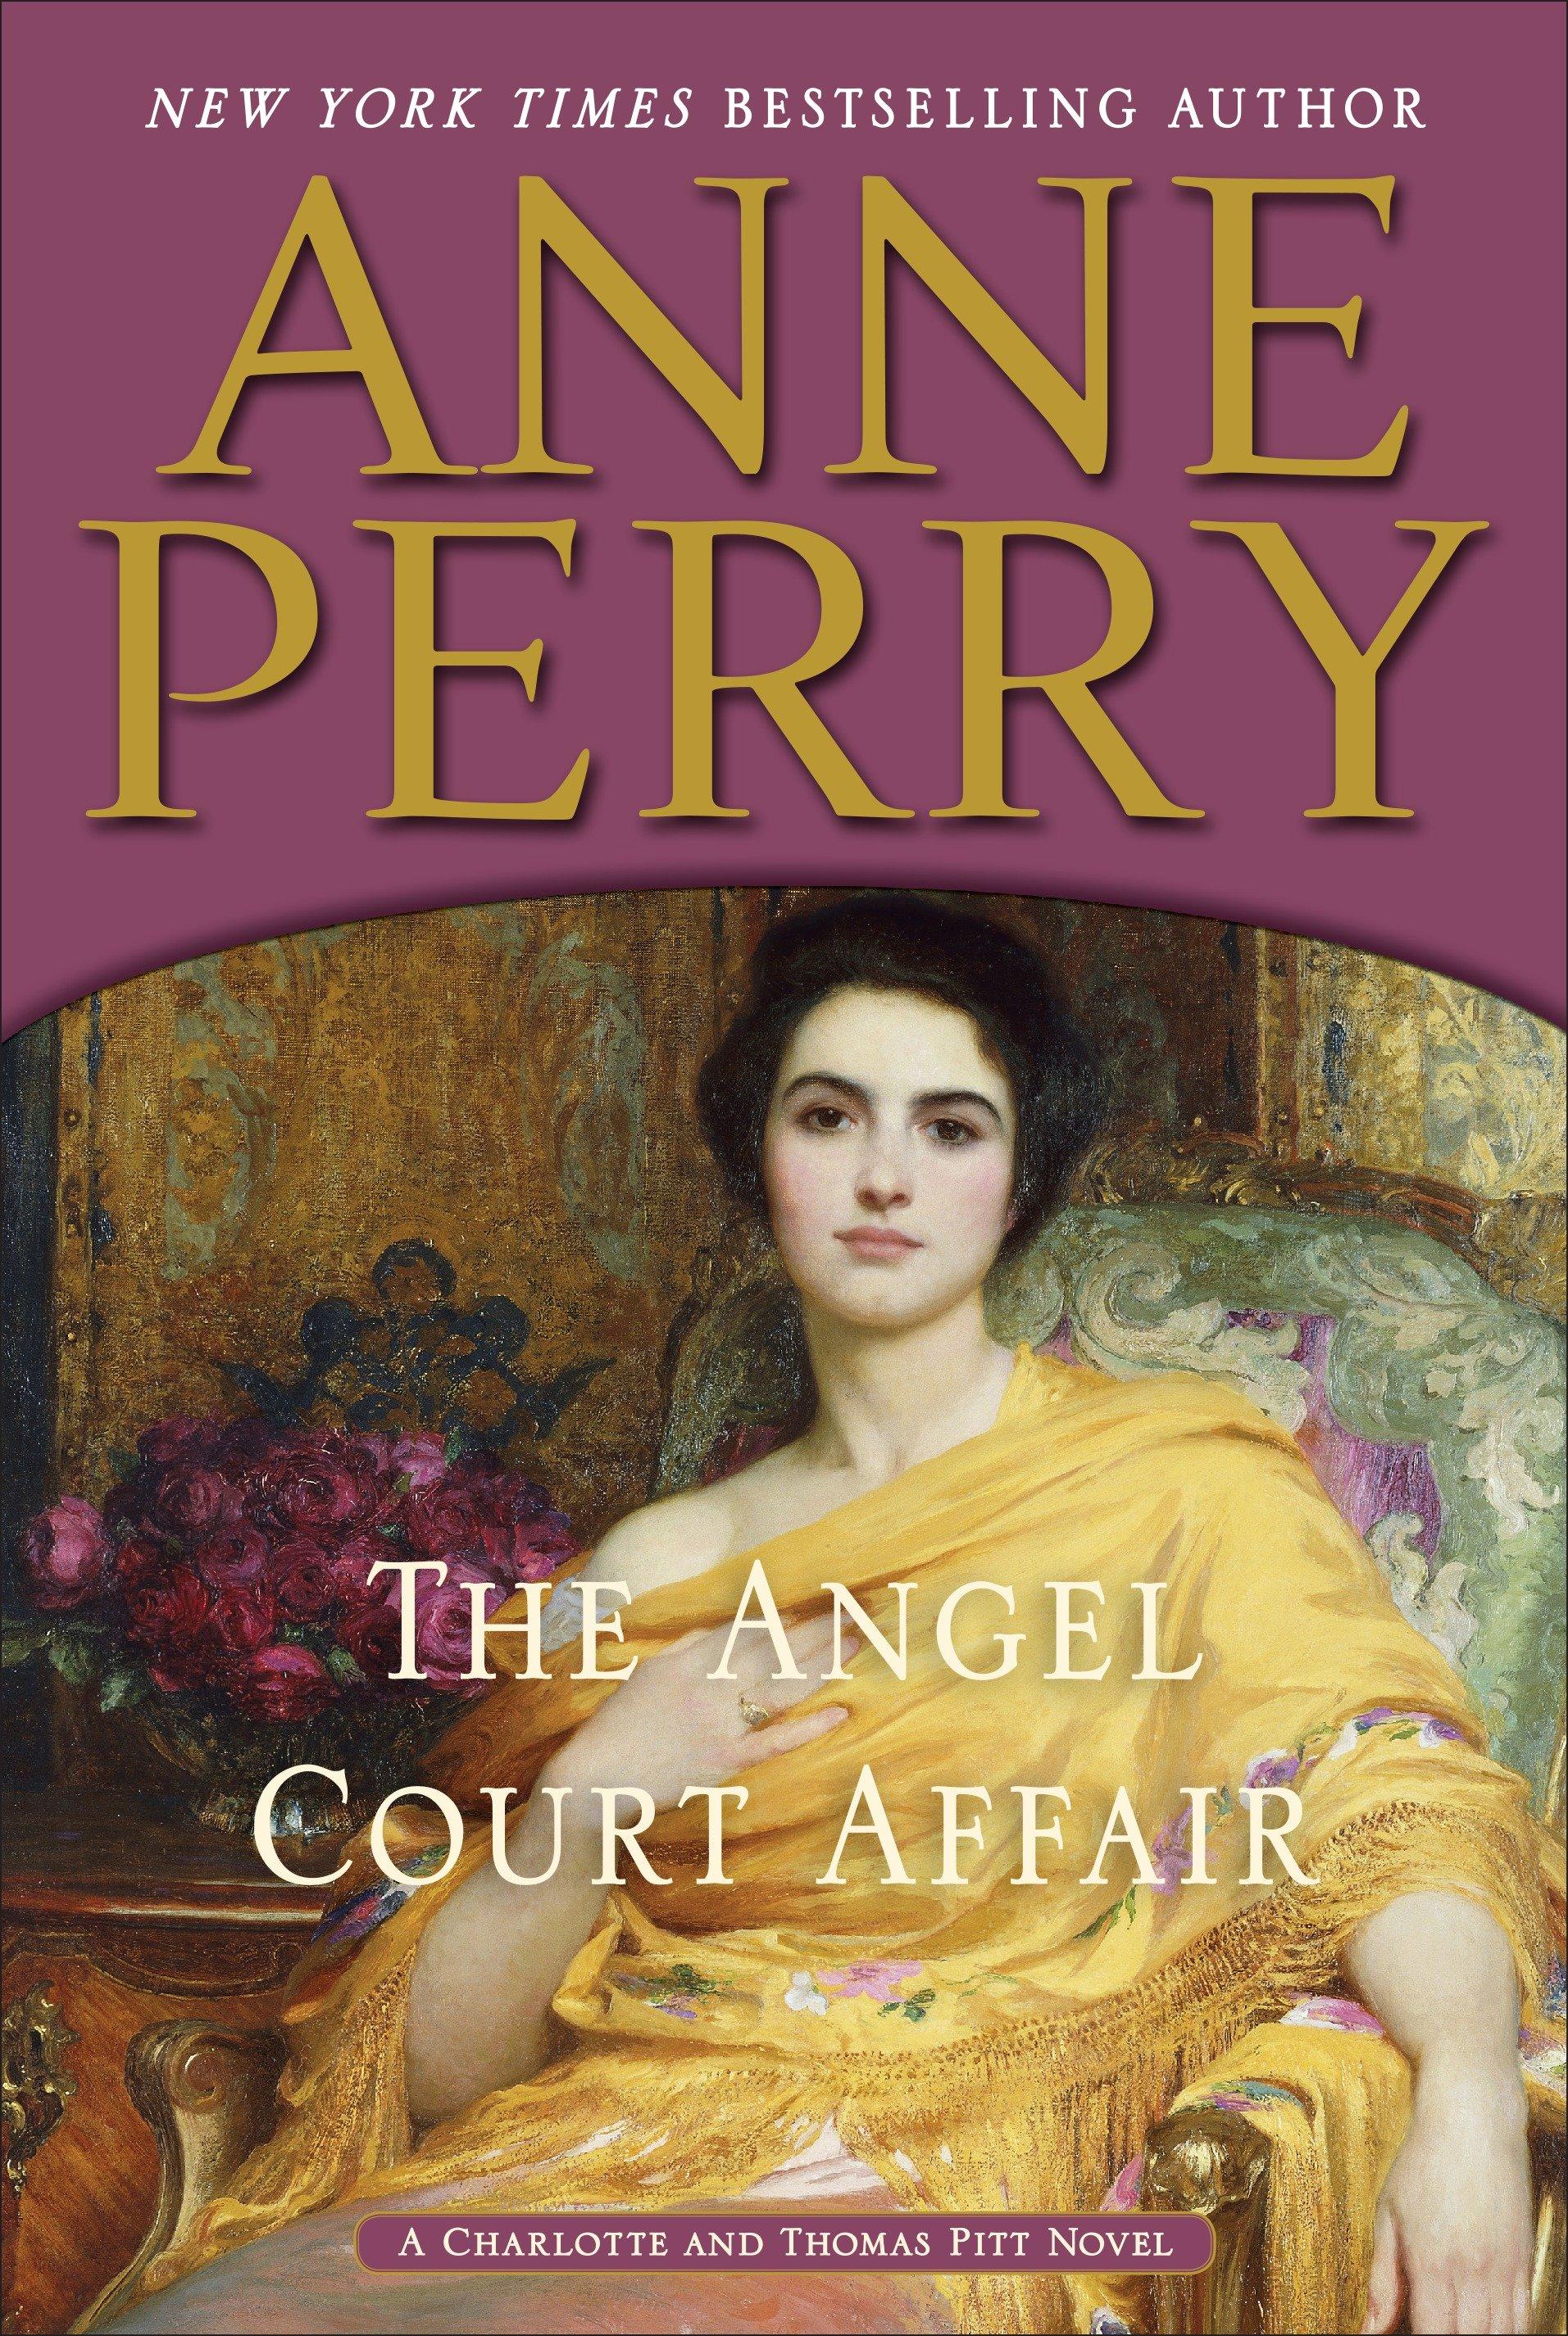 The Angel Court Affair A Charlotte and Thomas Pitt Novel